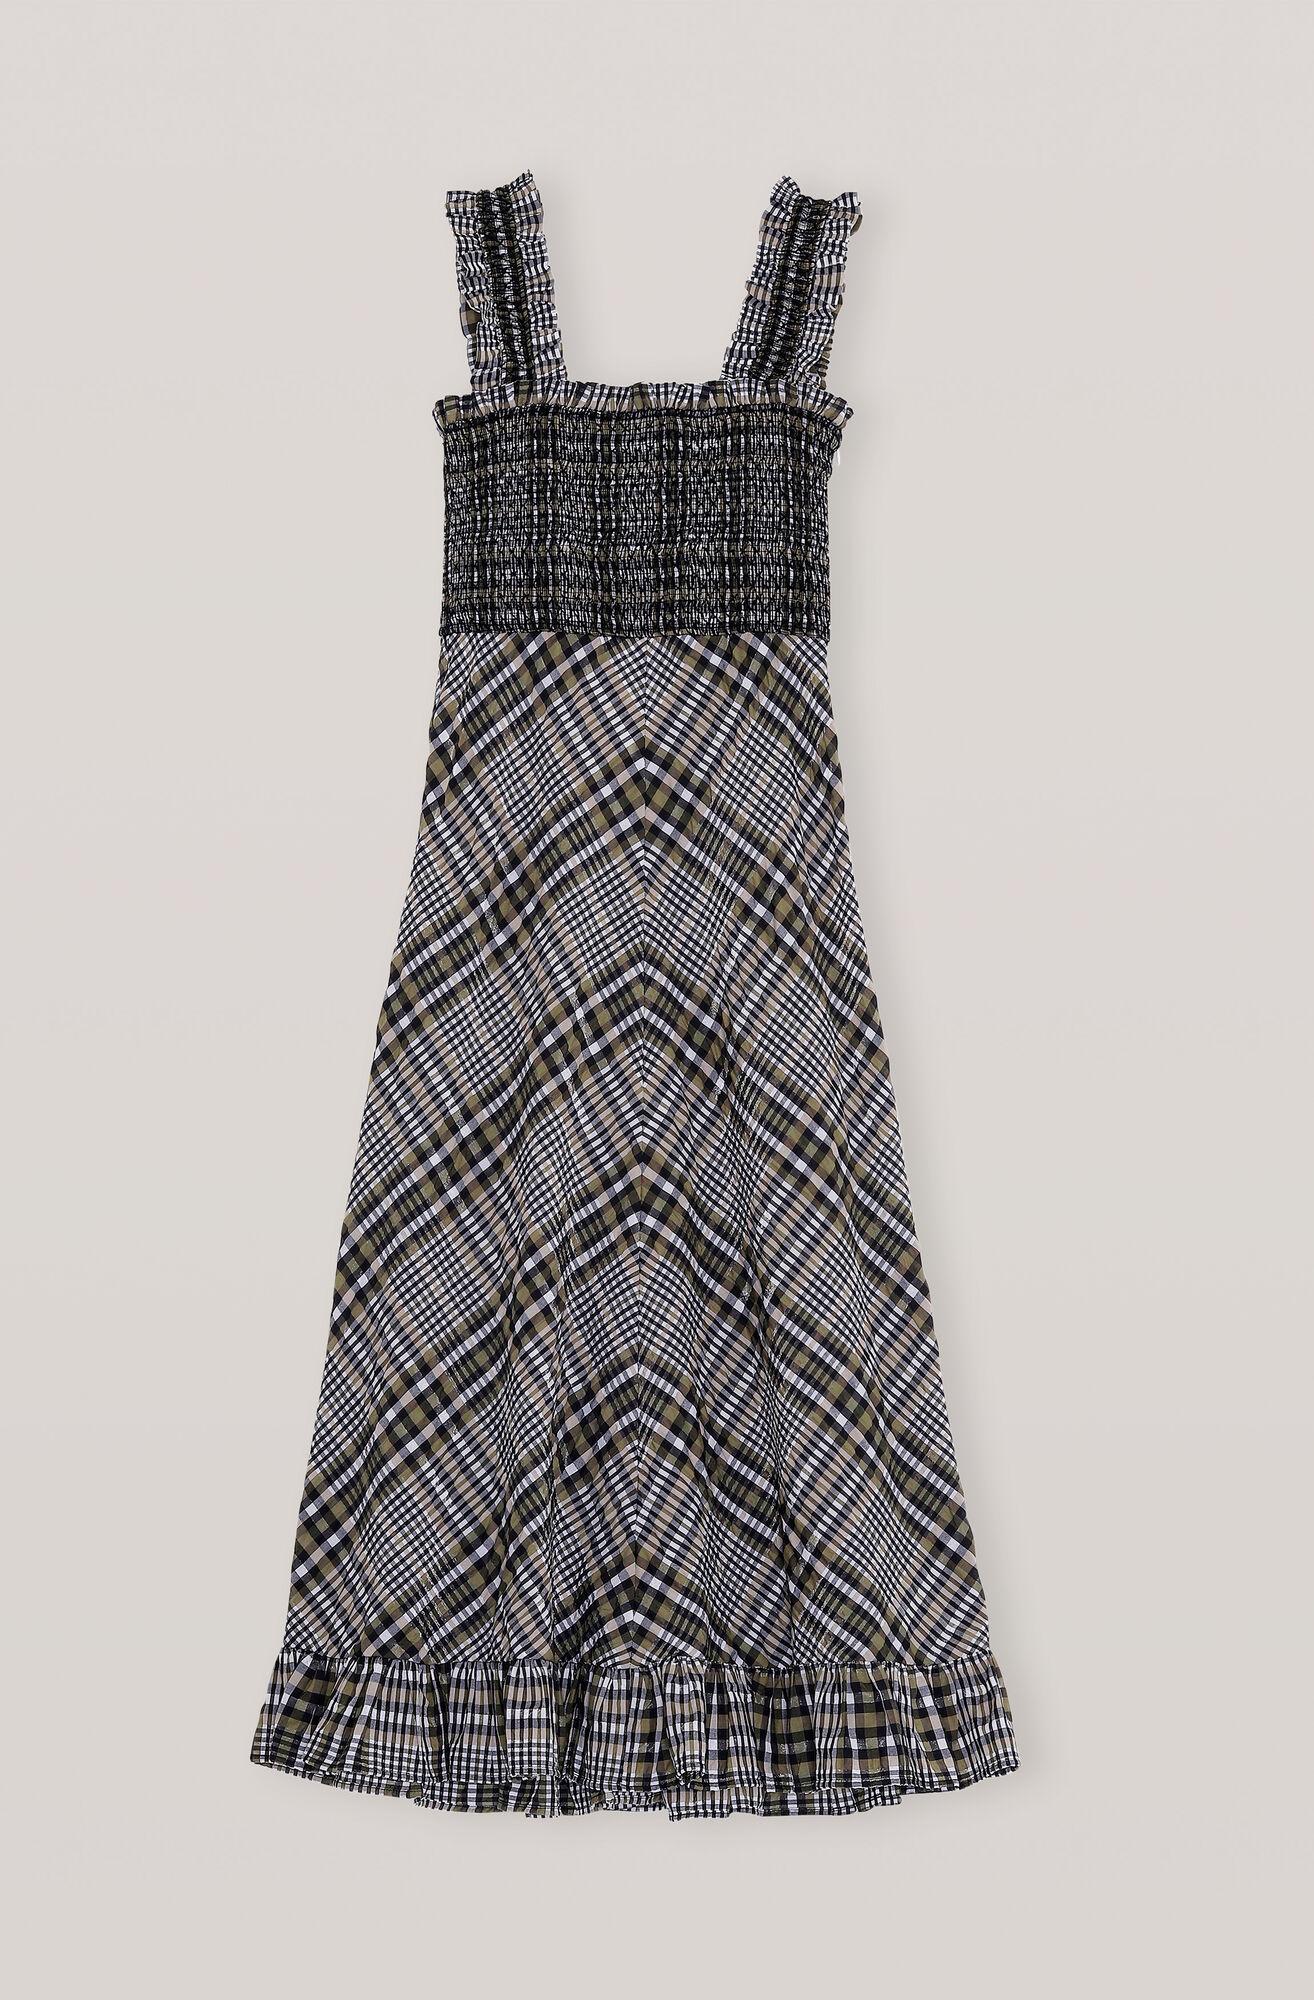 Ganni Seersucker Check Maxi Dress 1699 00 Dkk Shop Your New